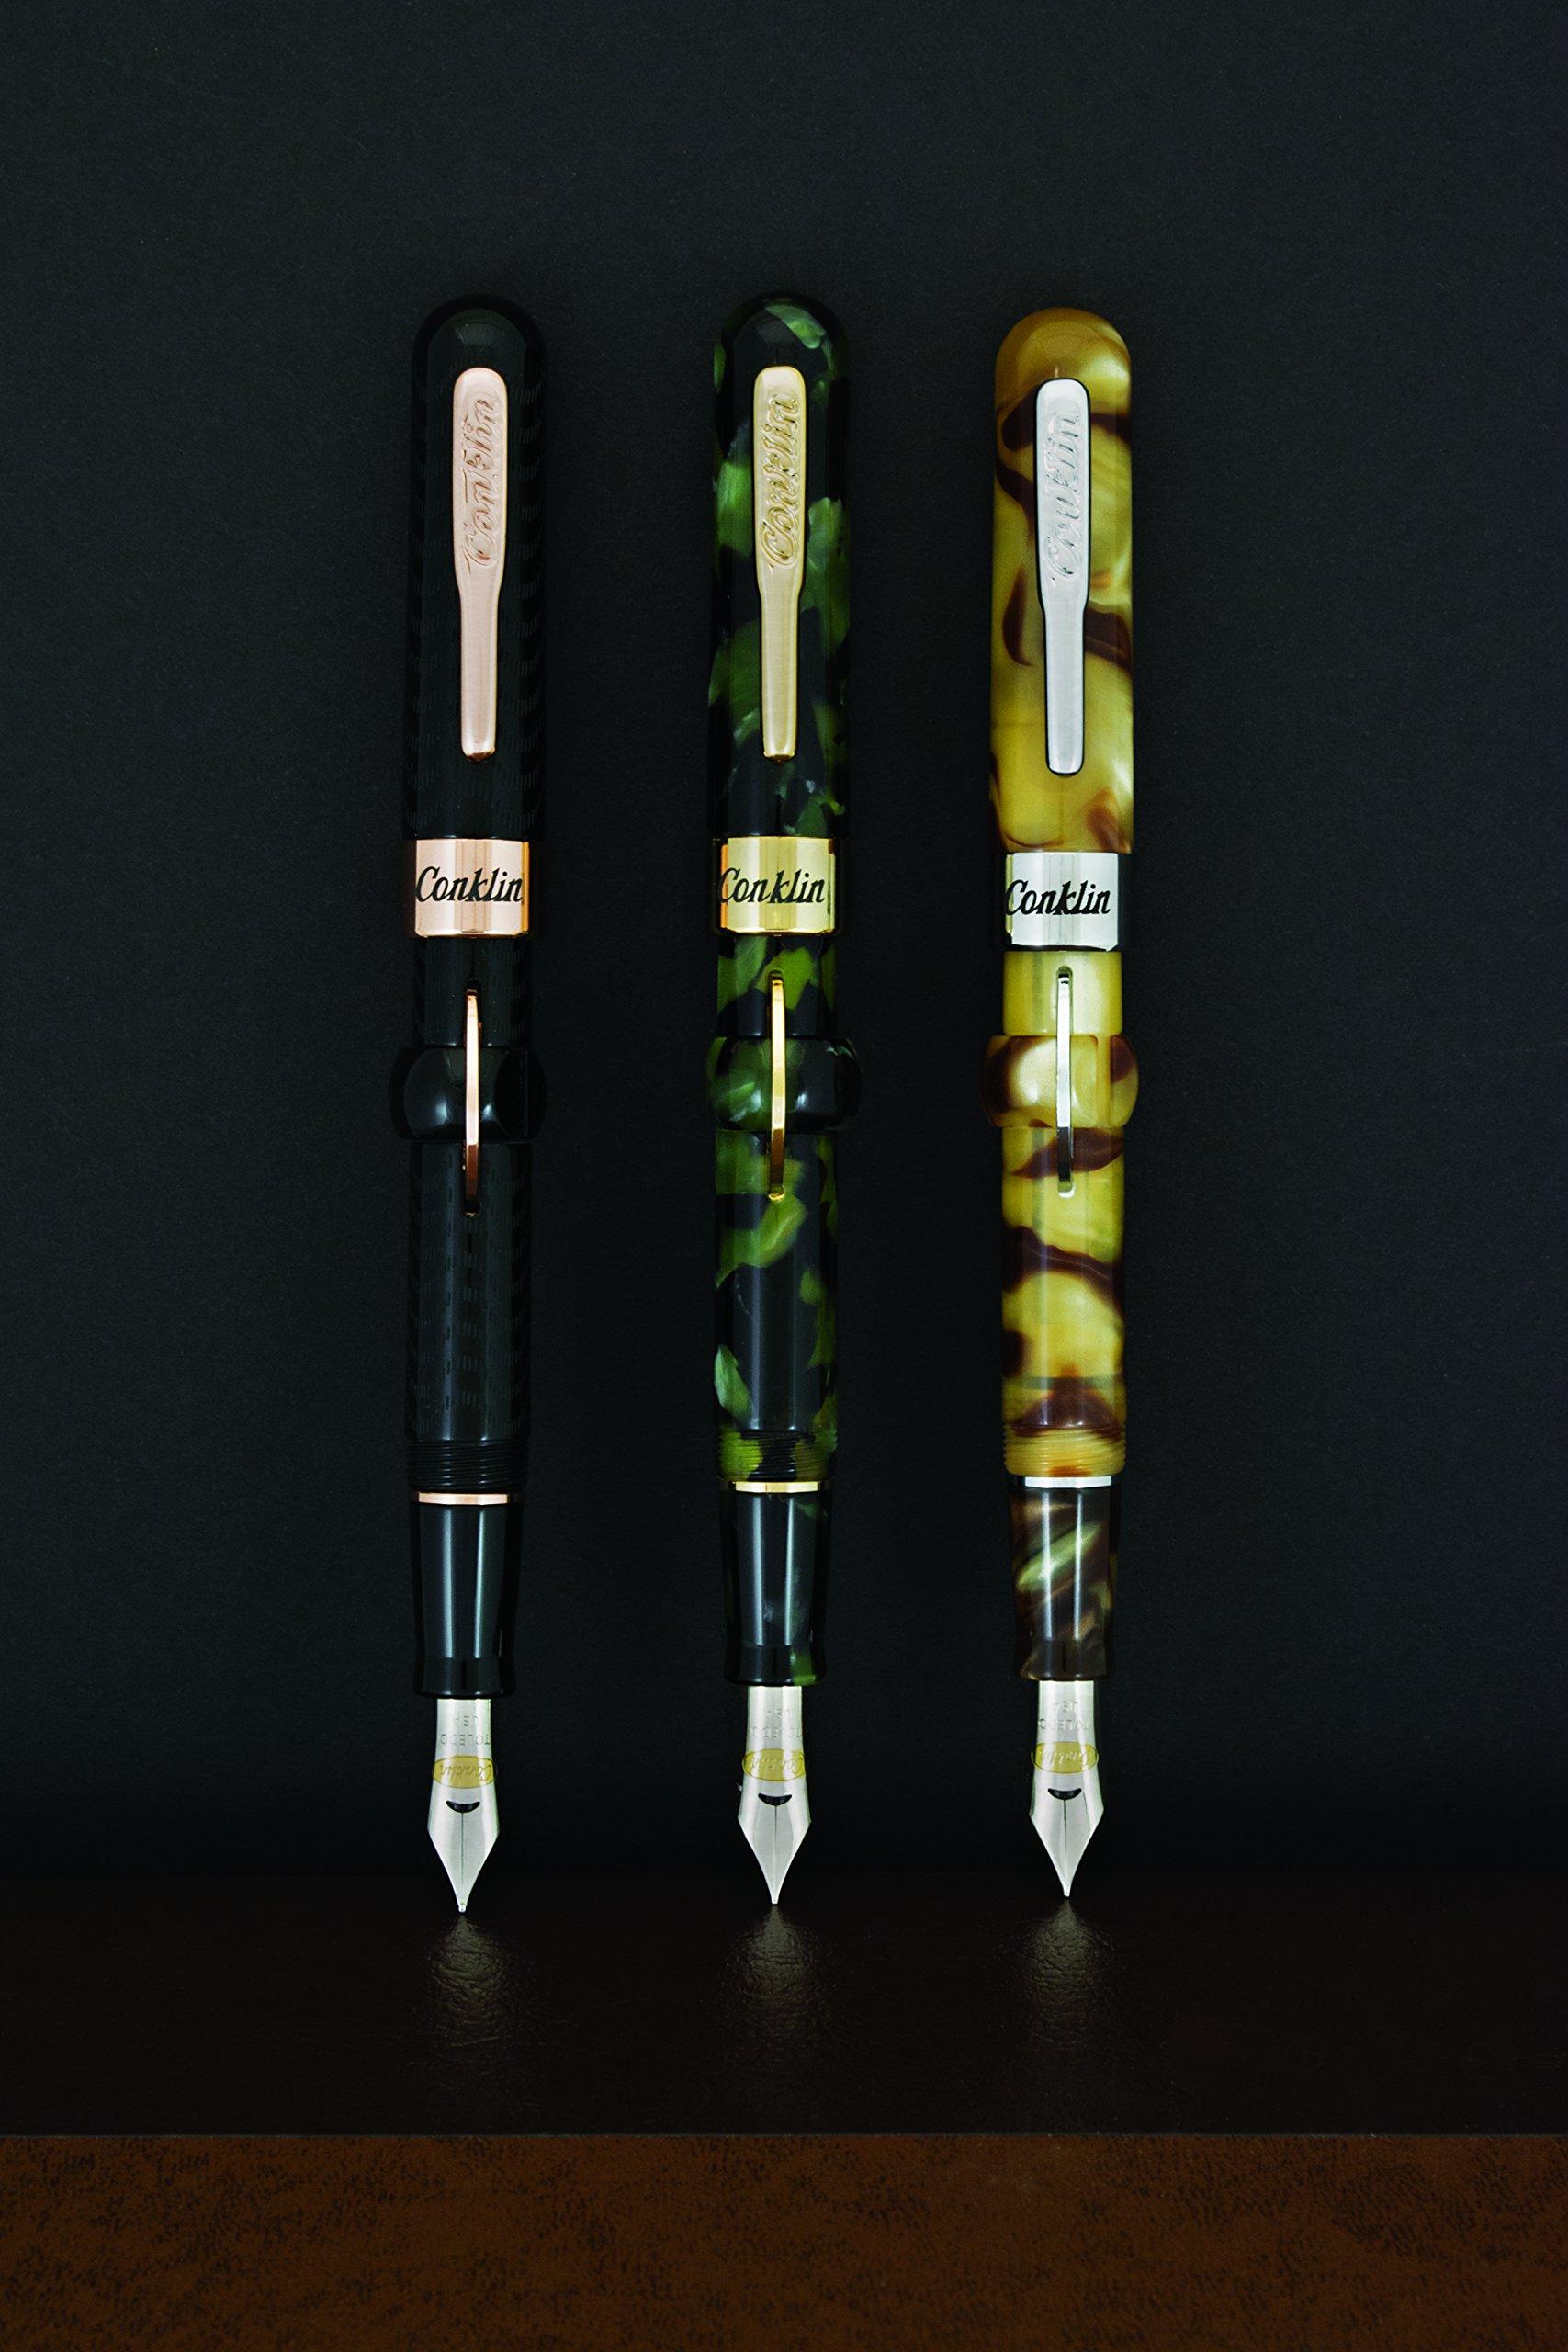 Conklin Mark Twain Crescent Fountain Pen, Black Chased with Rose Gold Trim, Fine Nib (CK71137) by Conklin (Image #3)